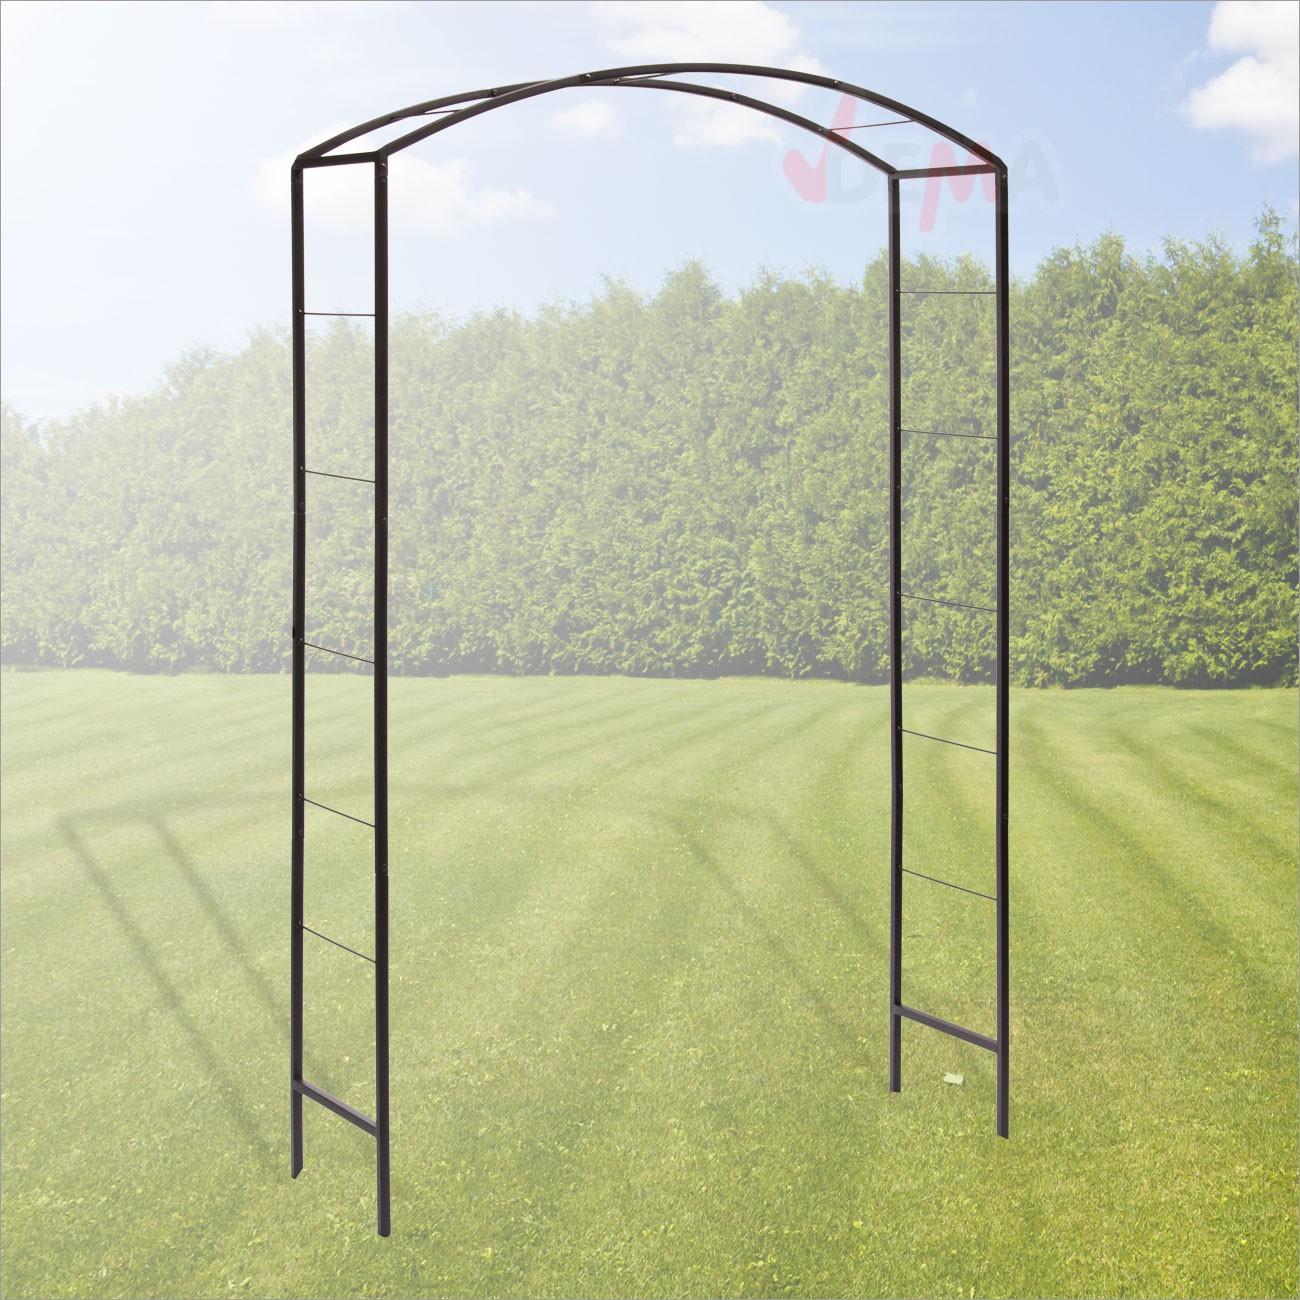 dema metall rosenbogen garda rankhilfe pergola spalier torbogen rankgitter ebay. Black Bedroom Furniture Sets. Home Design Ideas